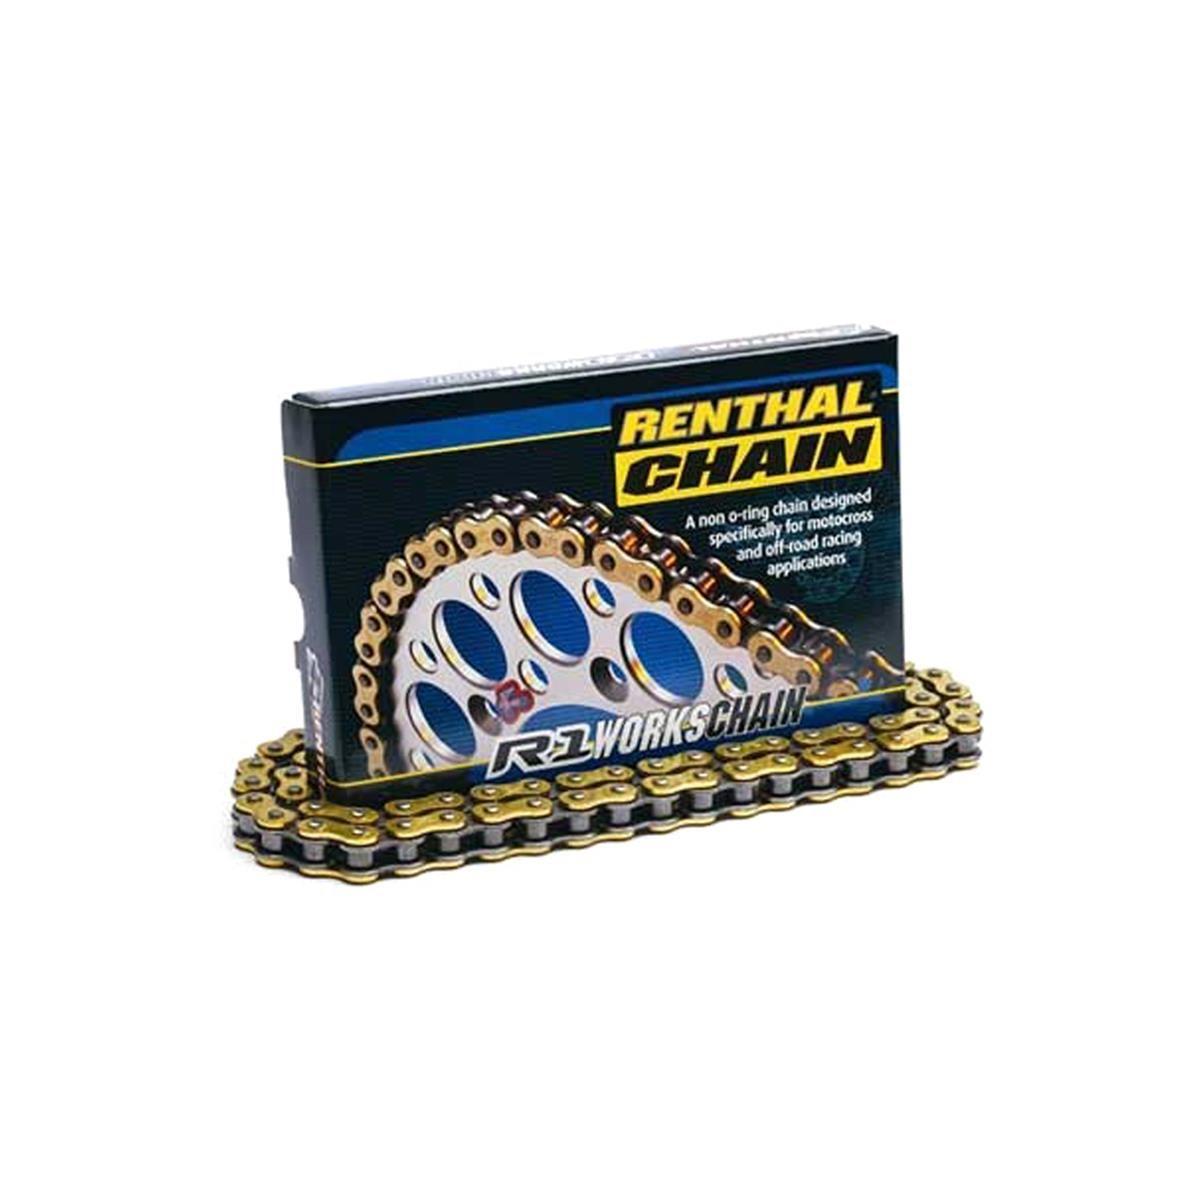 Renthal Kette R1 Gold Non-O-Ring, 420er Teilung